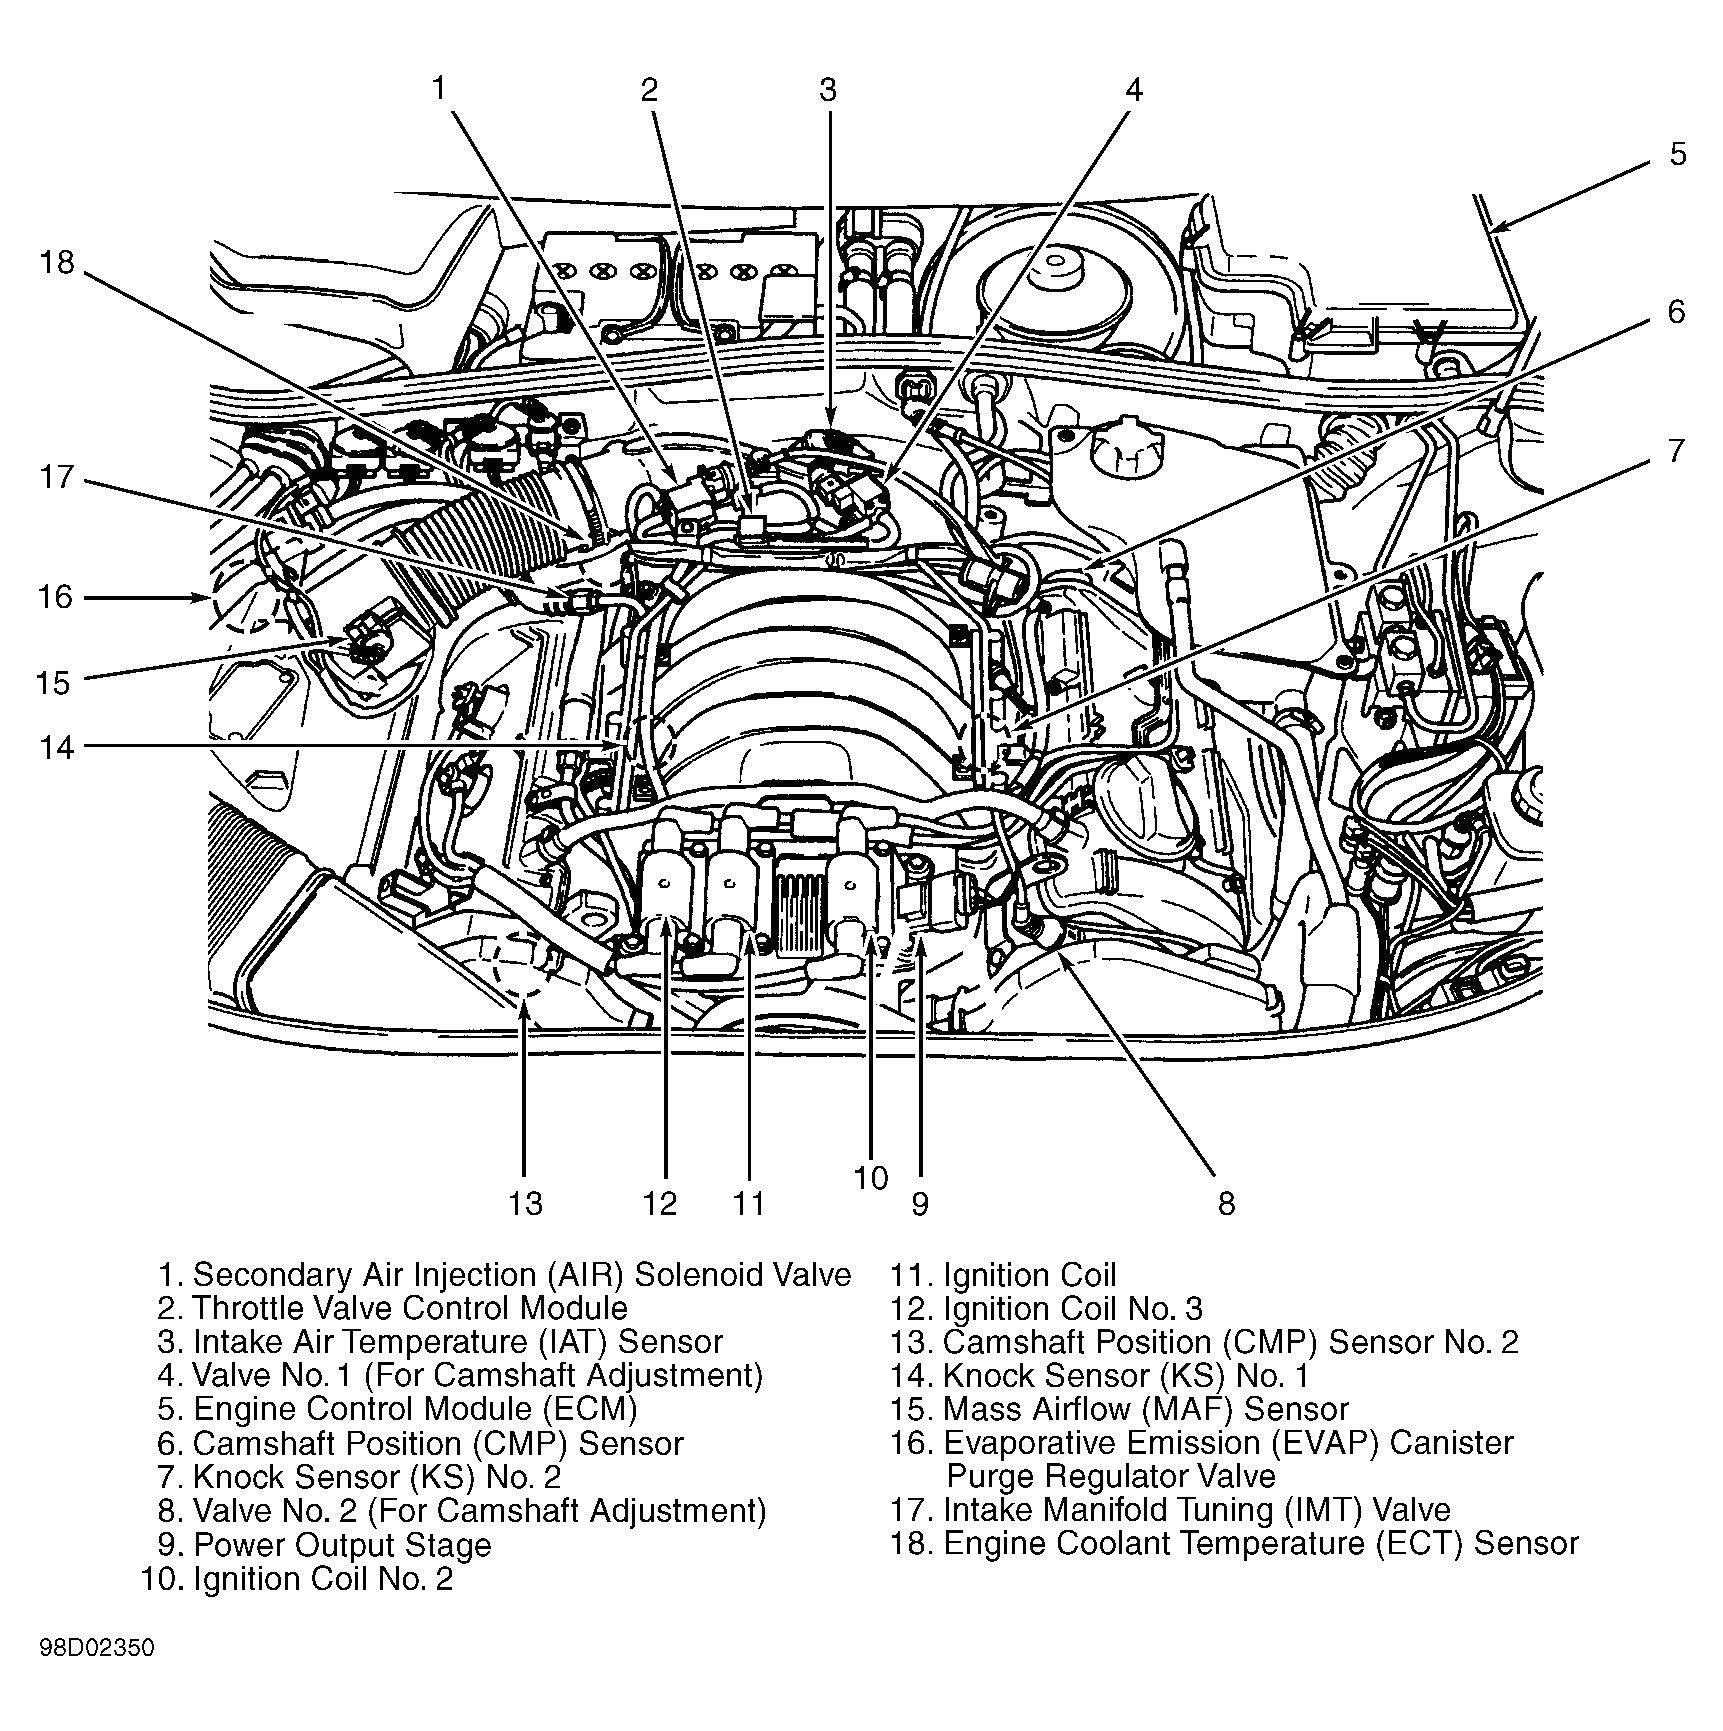 2001 dodge intrepid engine diagram wiring library in 2001 dodge intrepid engine diagram jpg